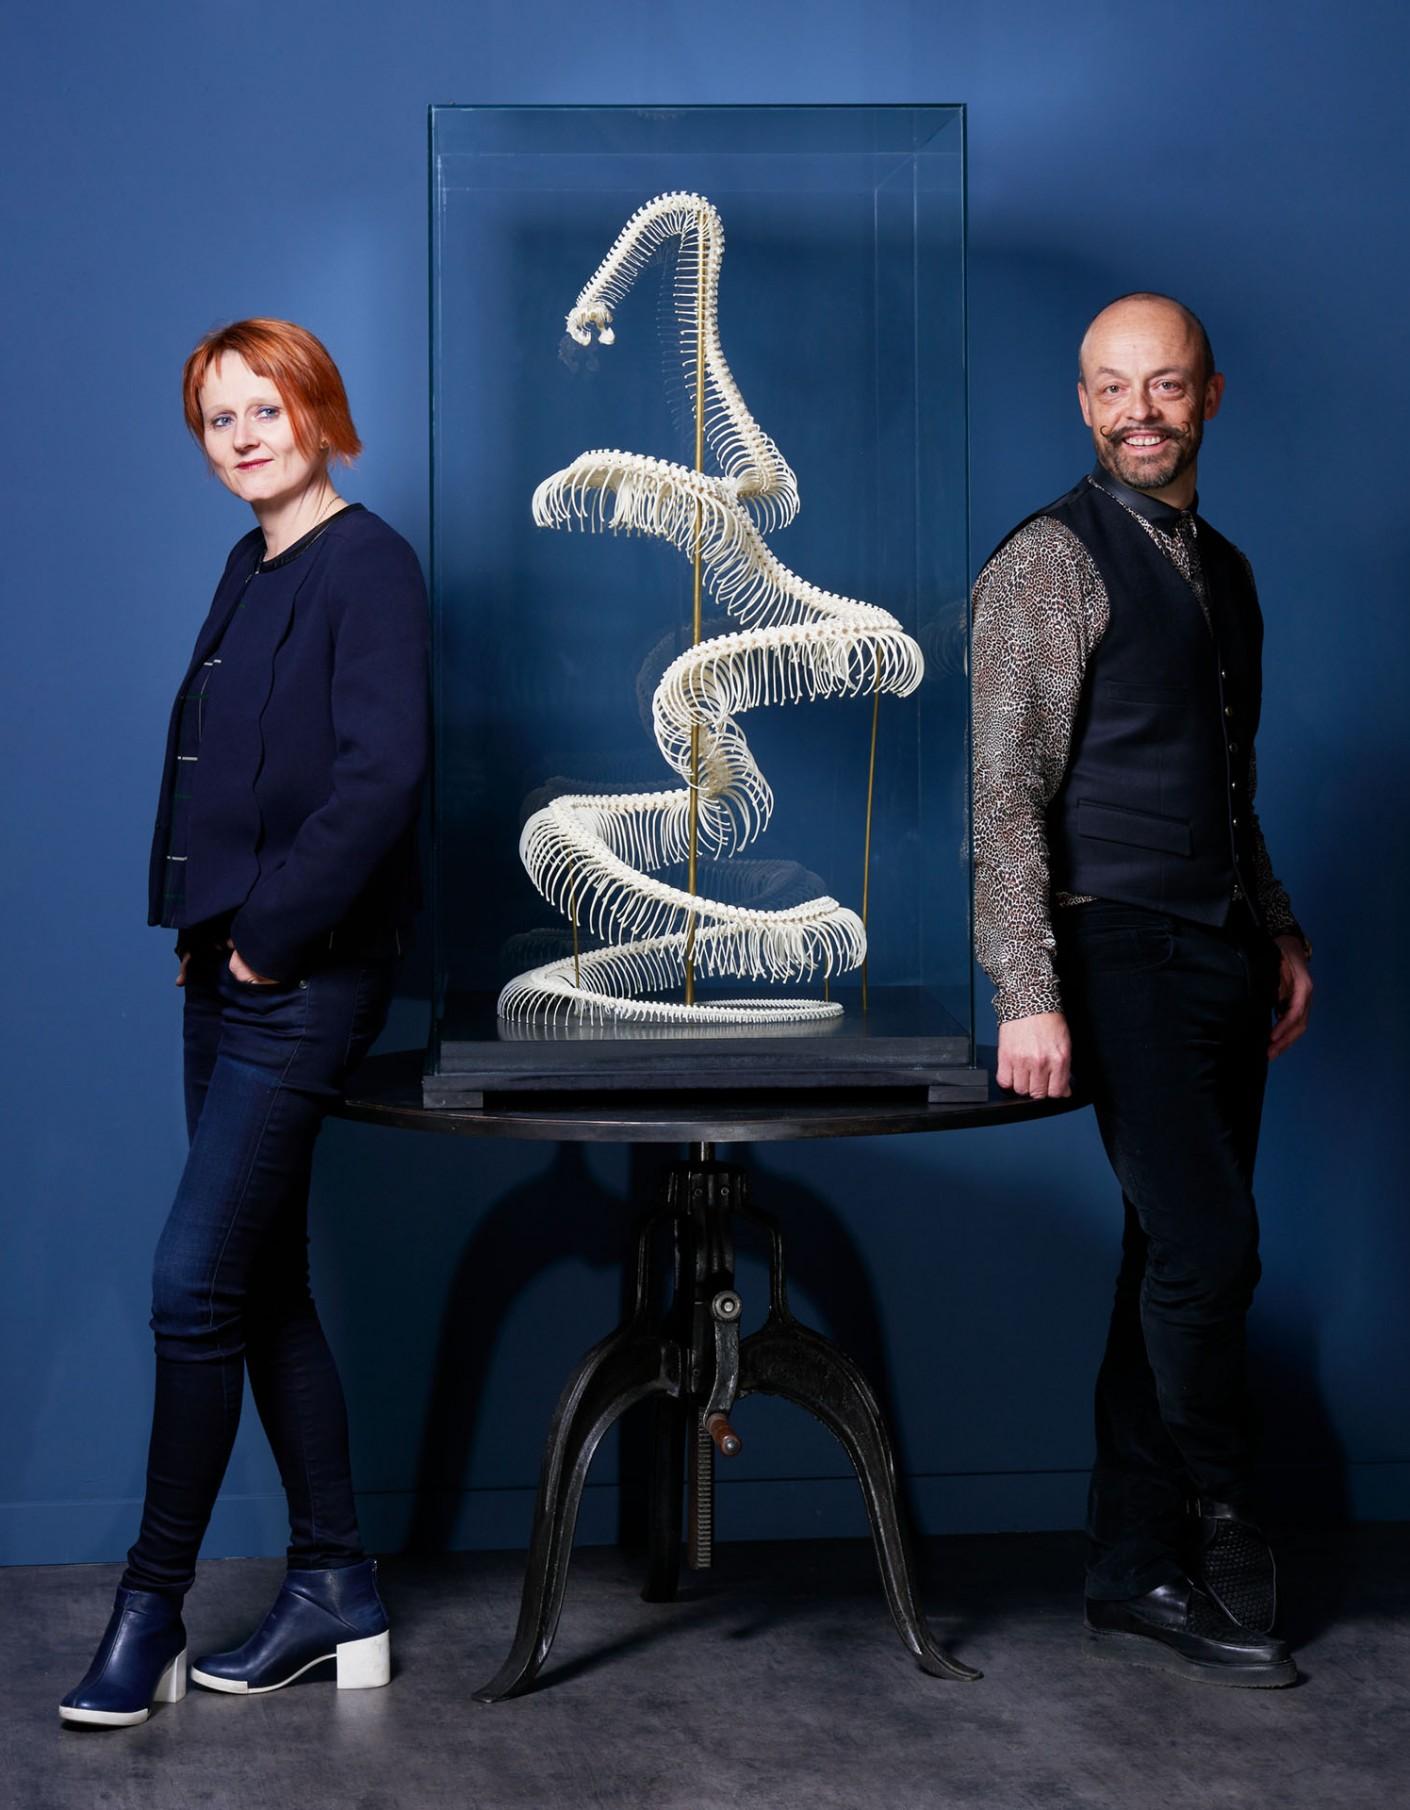 Lilau & Pierre-Emmanuel Grange-Jaricot - janvier 201